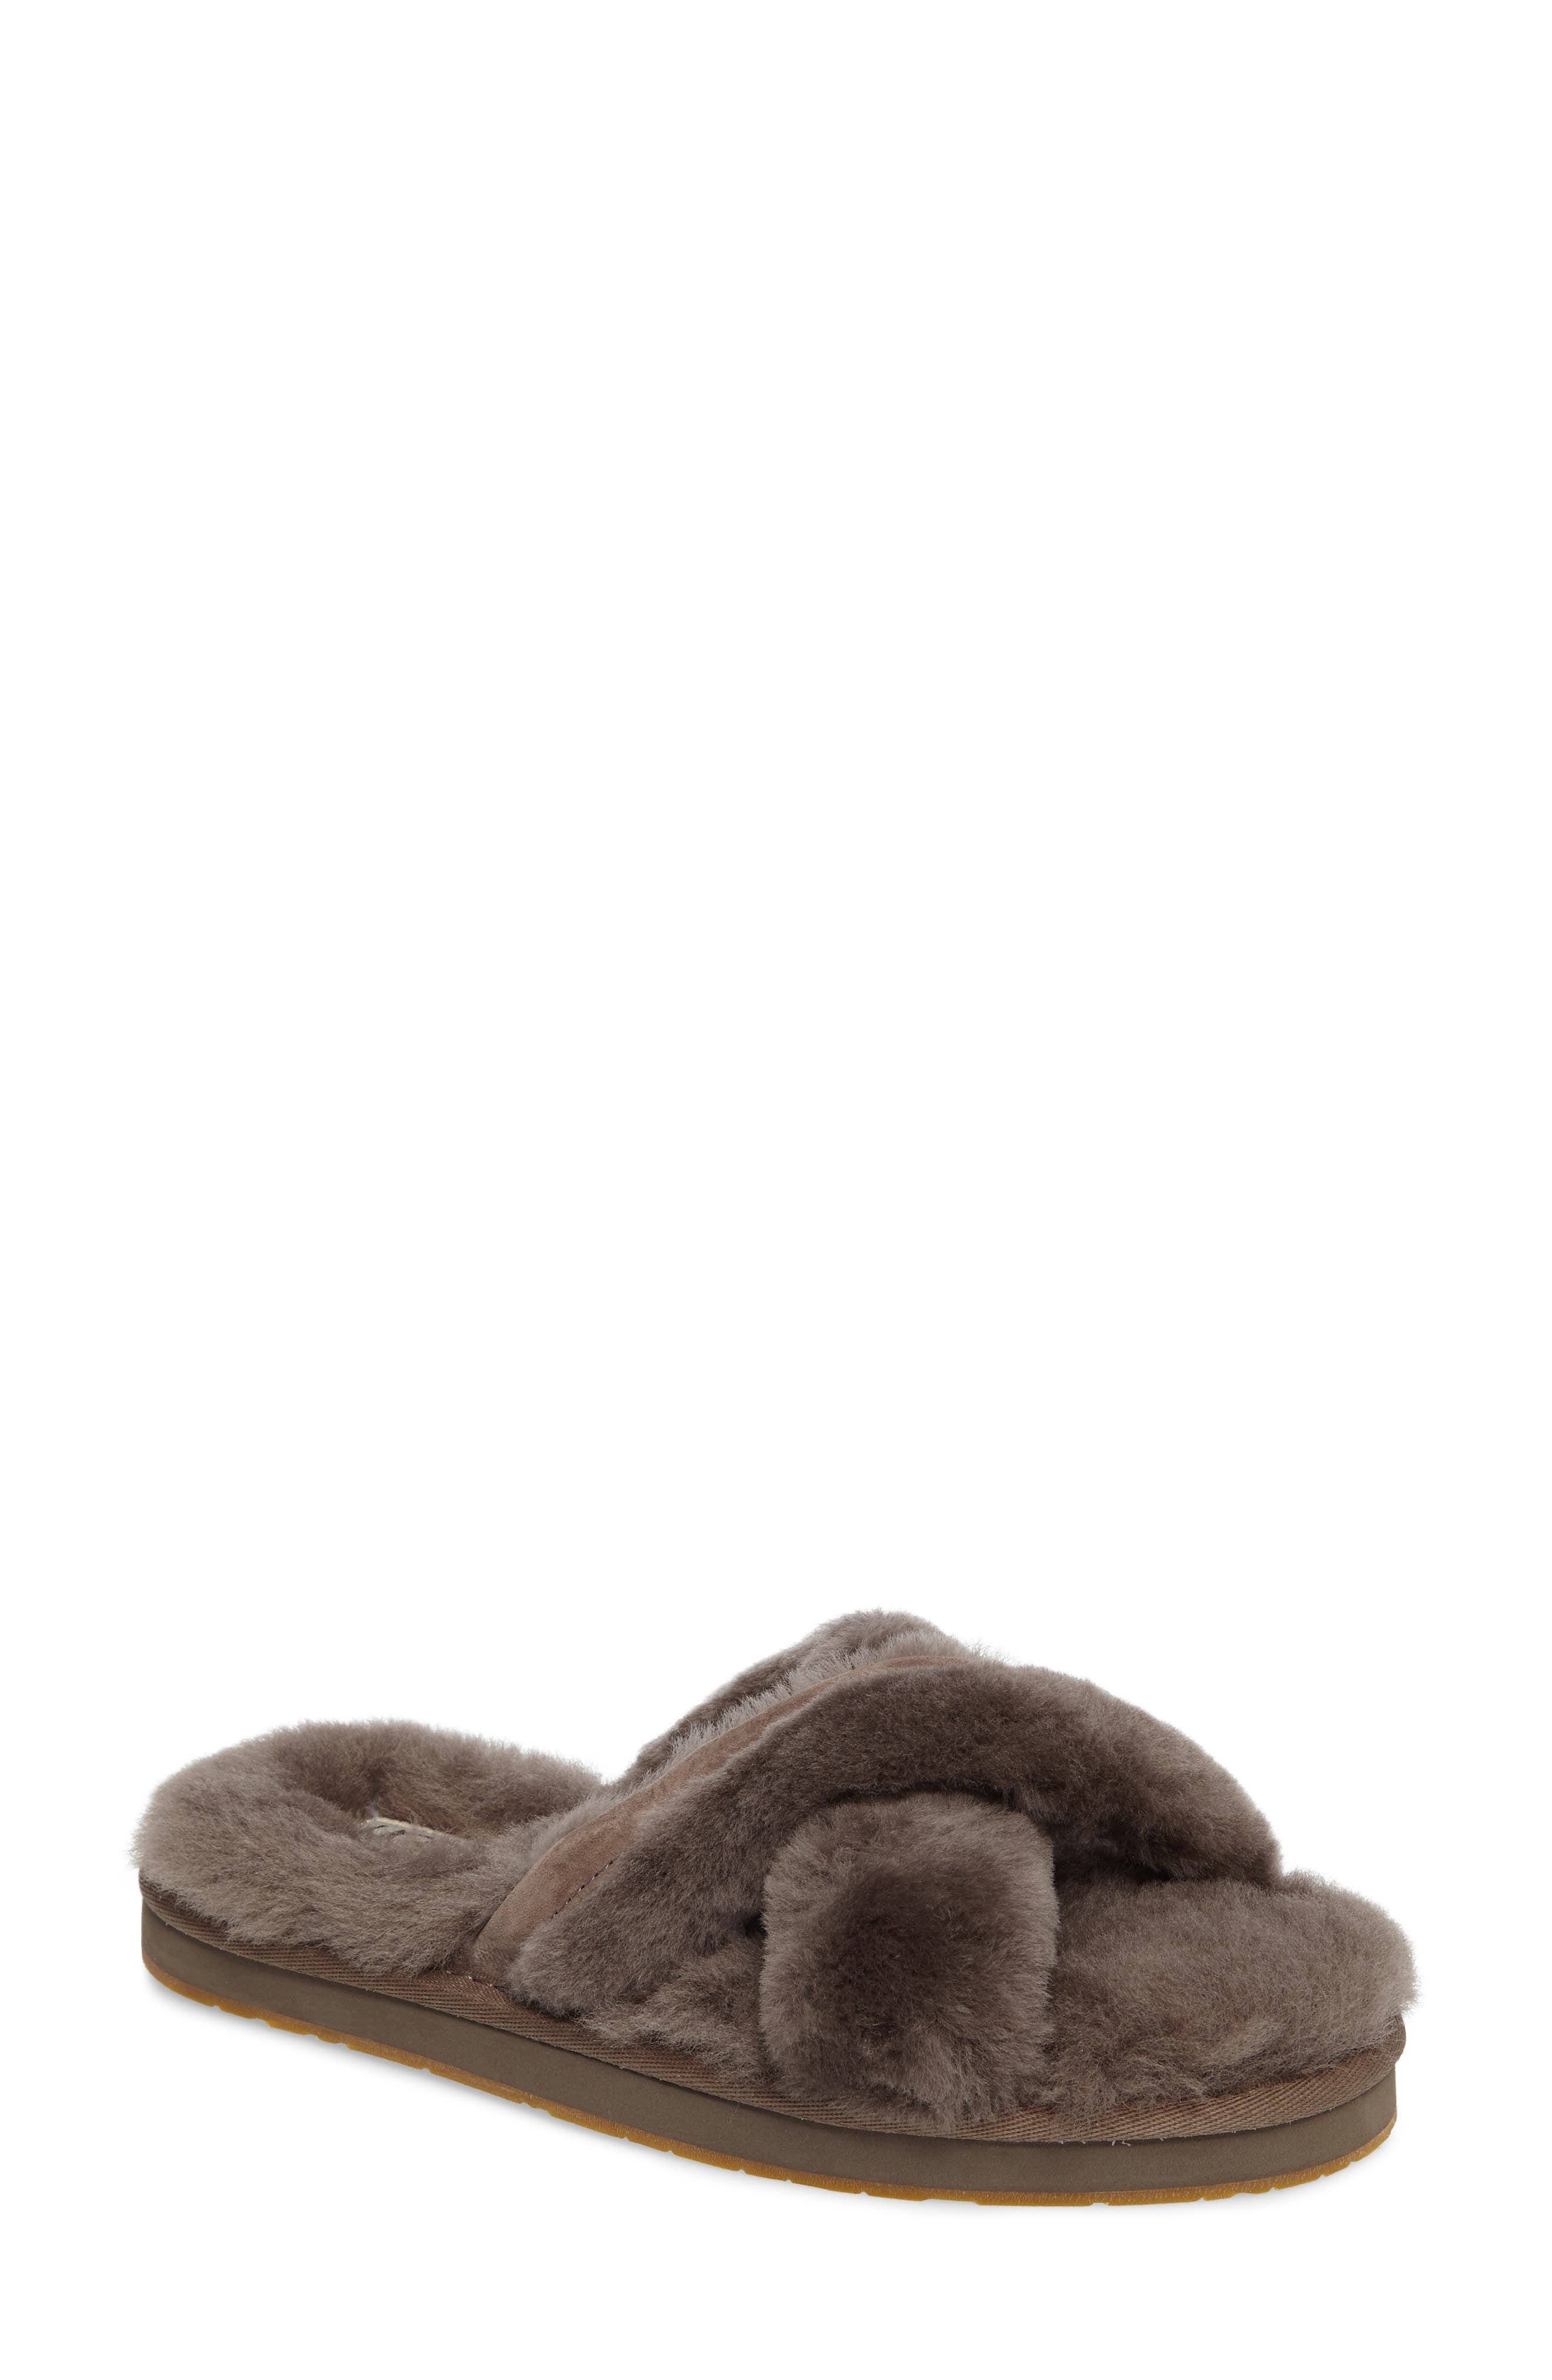 Main Image - UGG® Abela Genuine Shearling Flip Flop (Women)